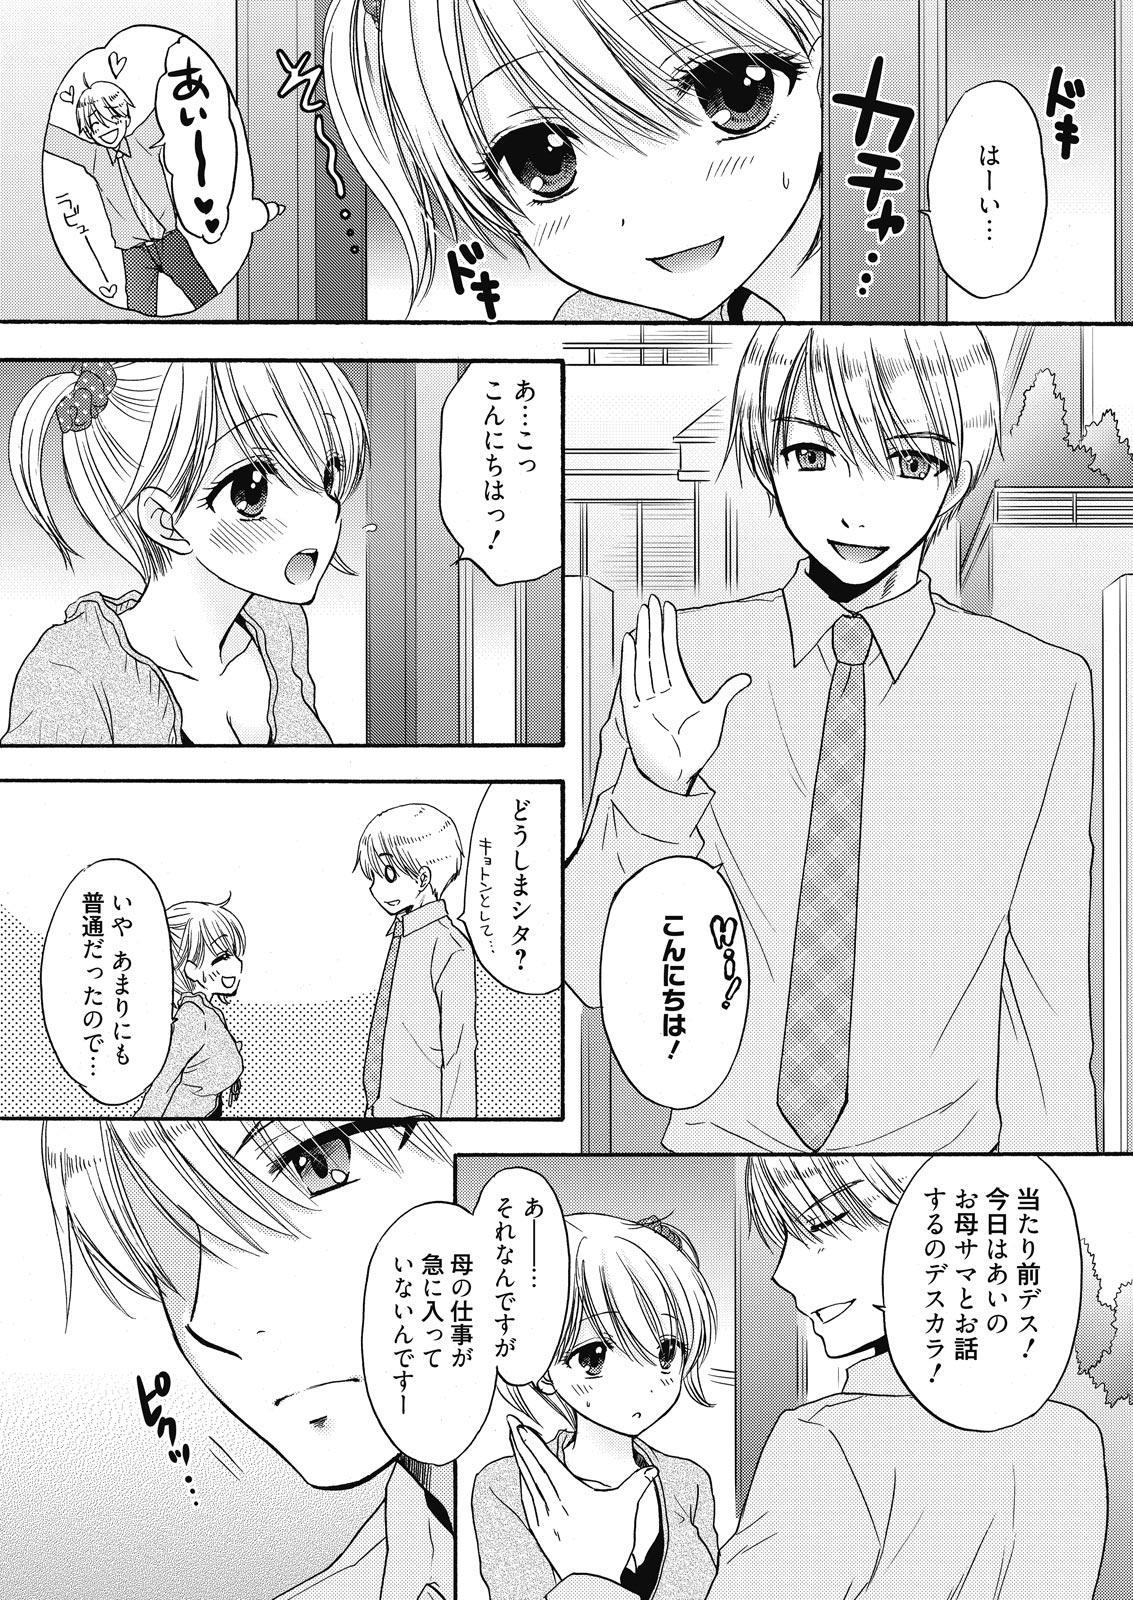 Web Manga Bangaichi Vol. 7 30